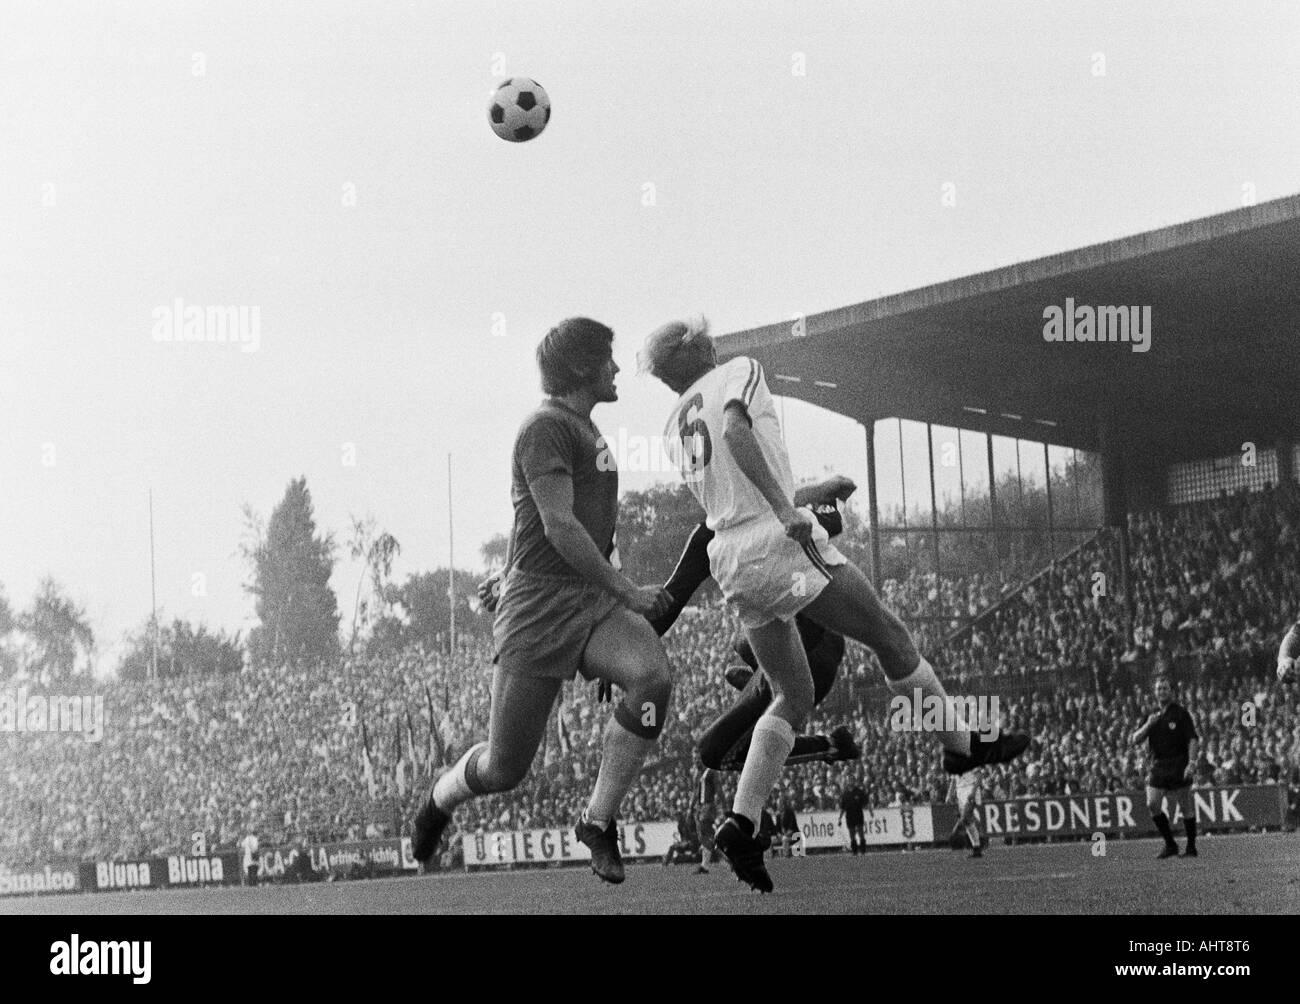 football, Bundesliga, 1971/1972, VfL Bochum versus Arminia Bielefeld 2:1, Stadium at the Castroper Strasse in Bochum, scene of the match, aerial duel between Peter Loof (Bielefeld) left and Manfred Ruesing (Bochum) - Stock Image